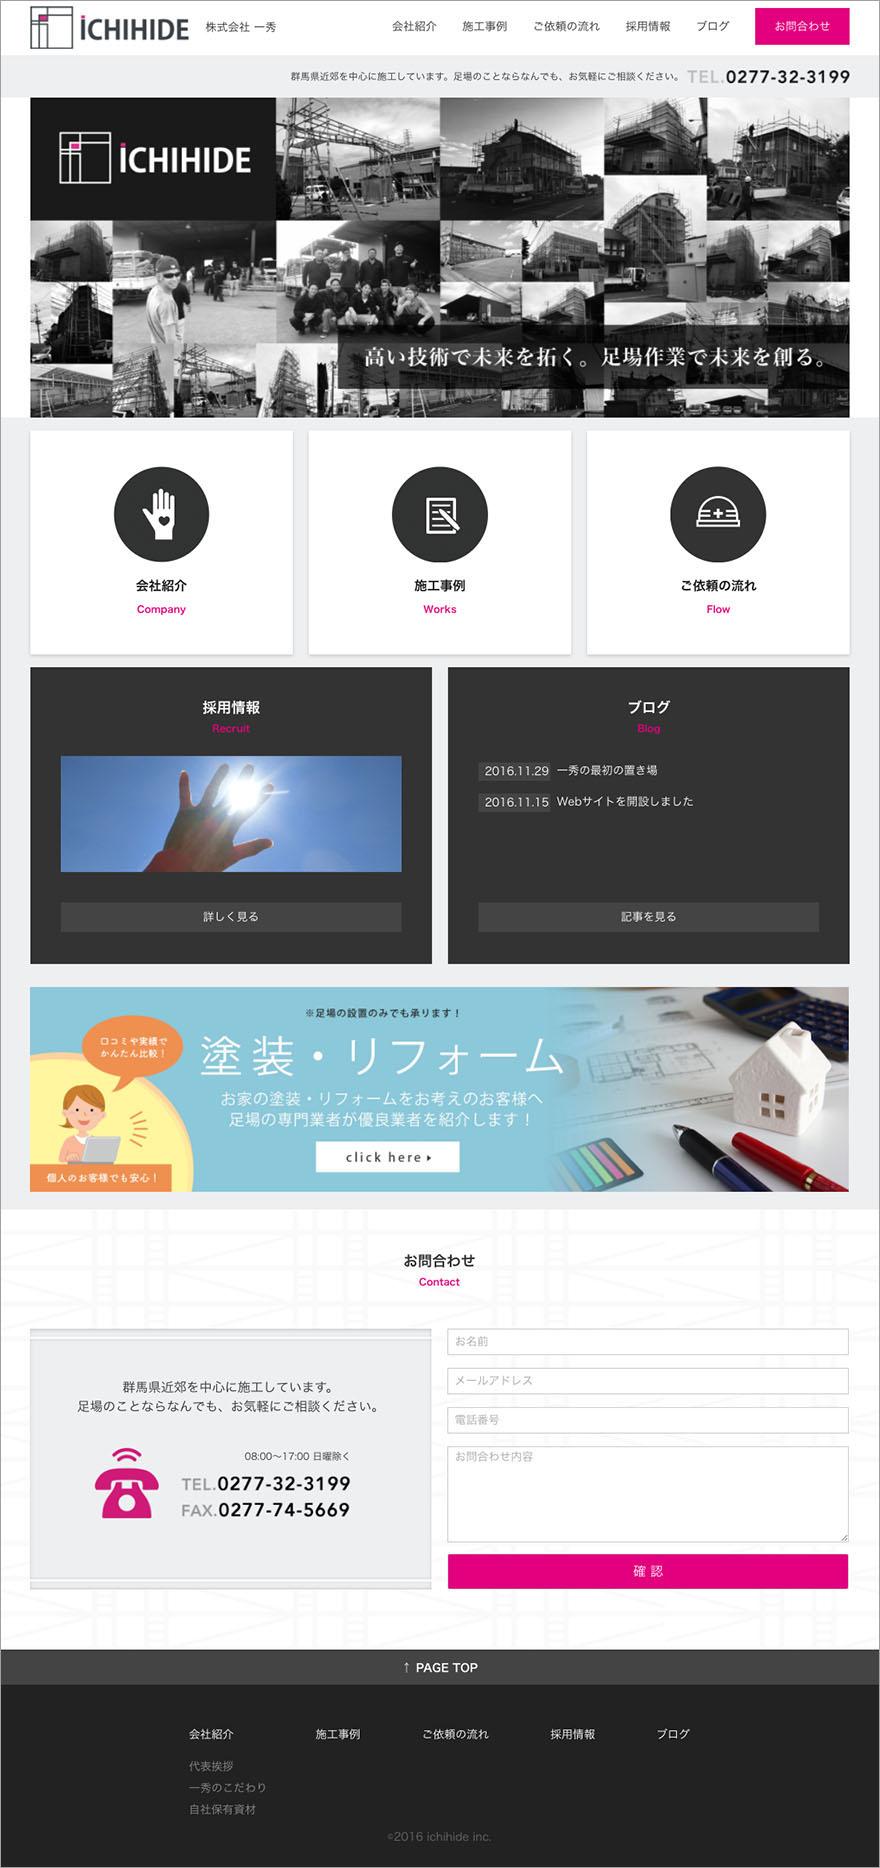 web_ichihide